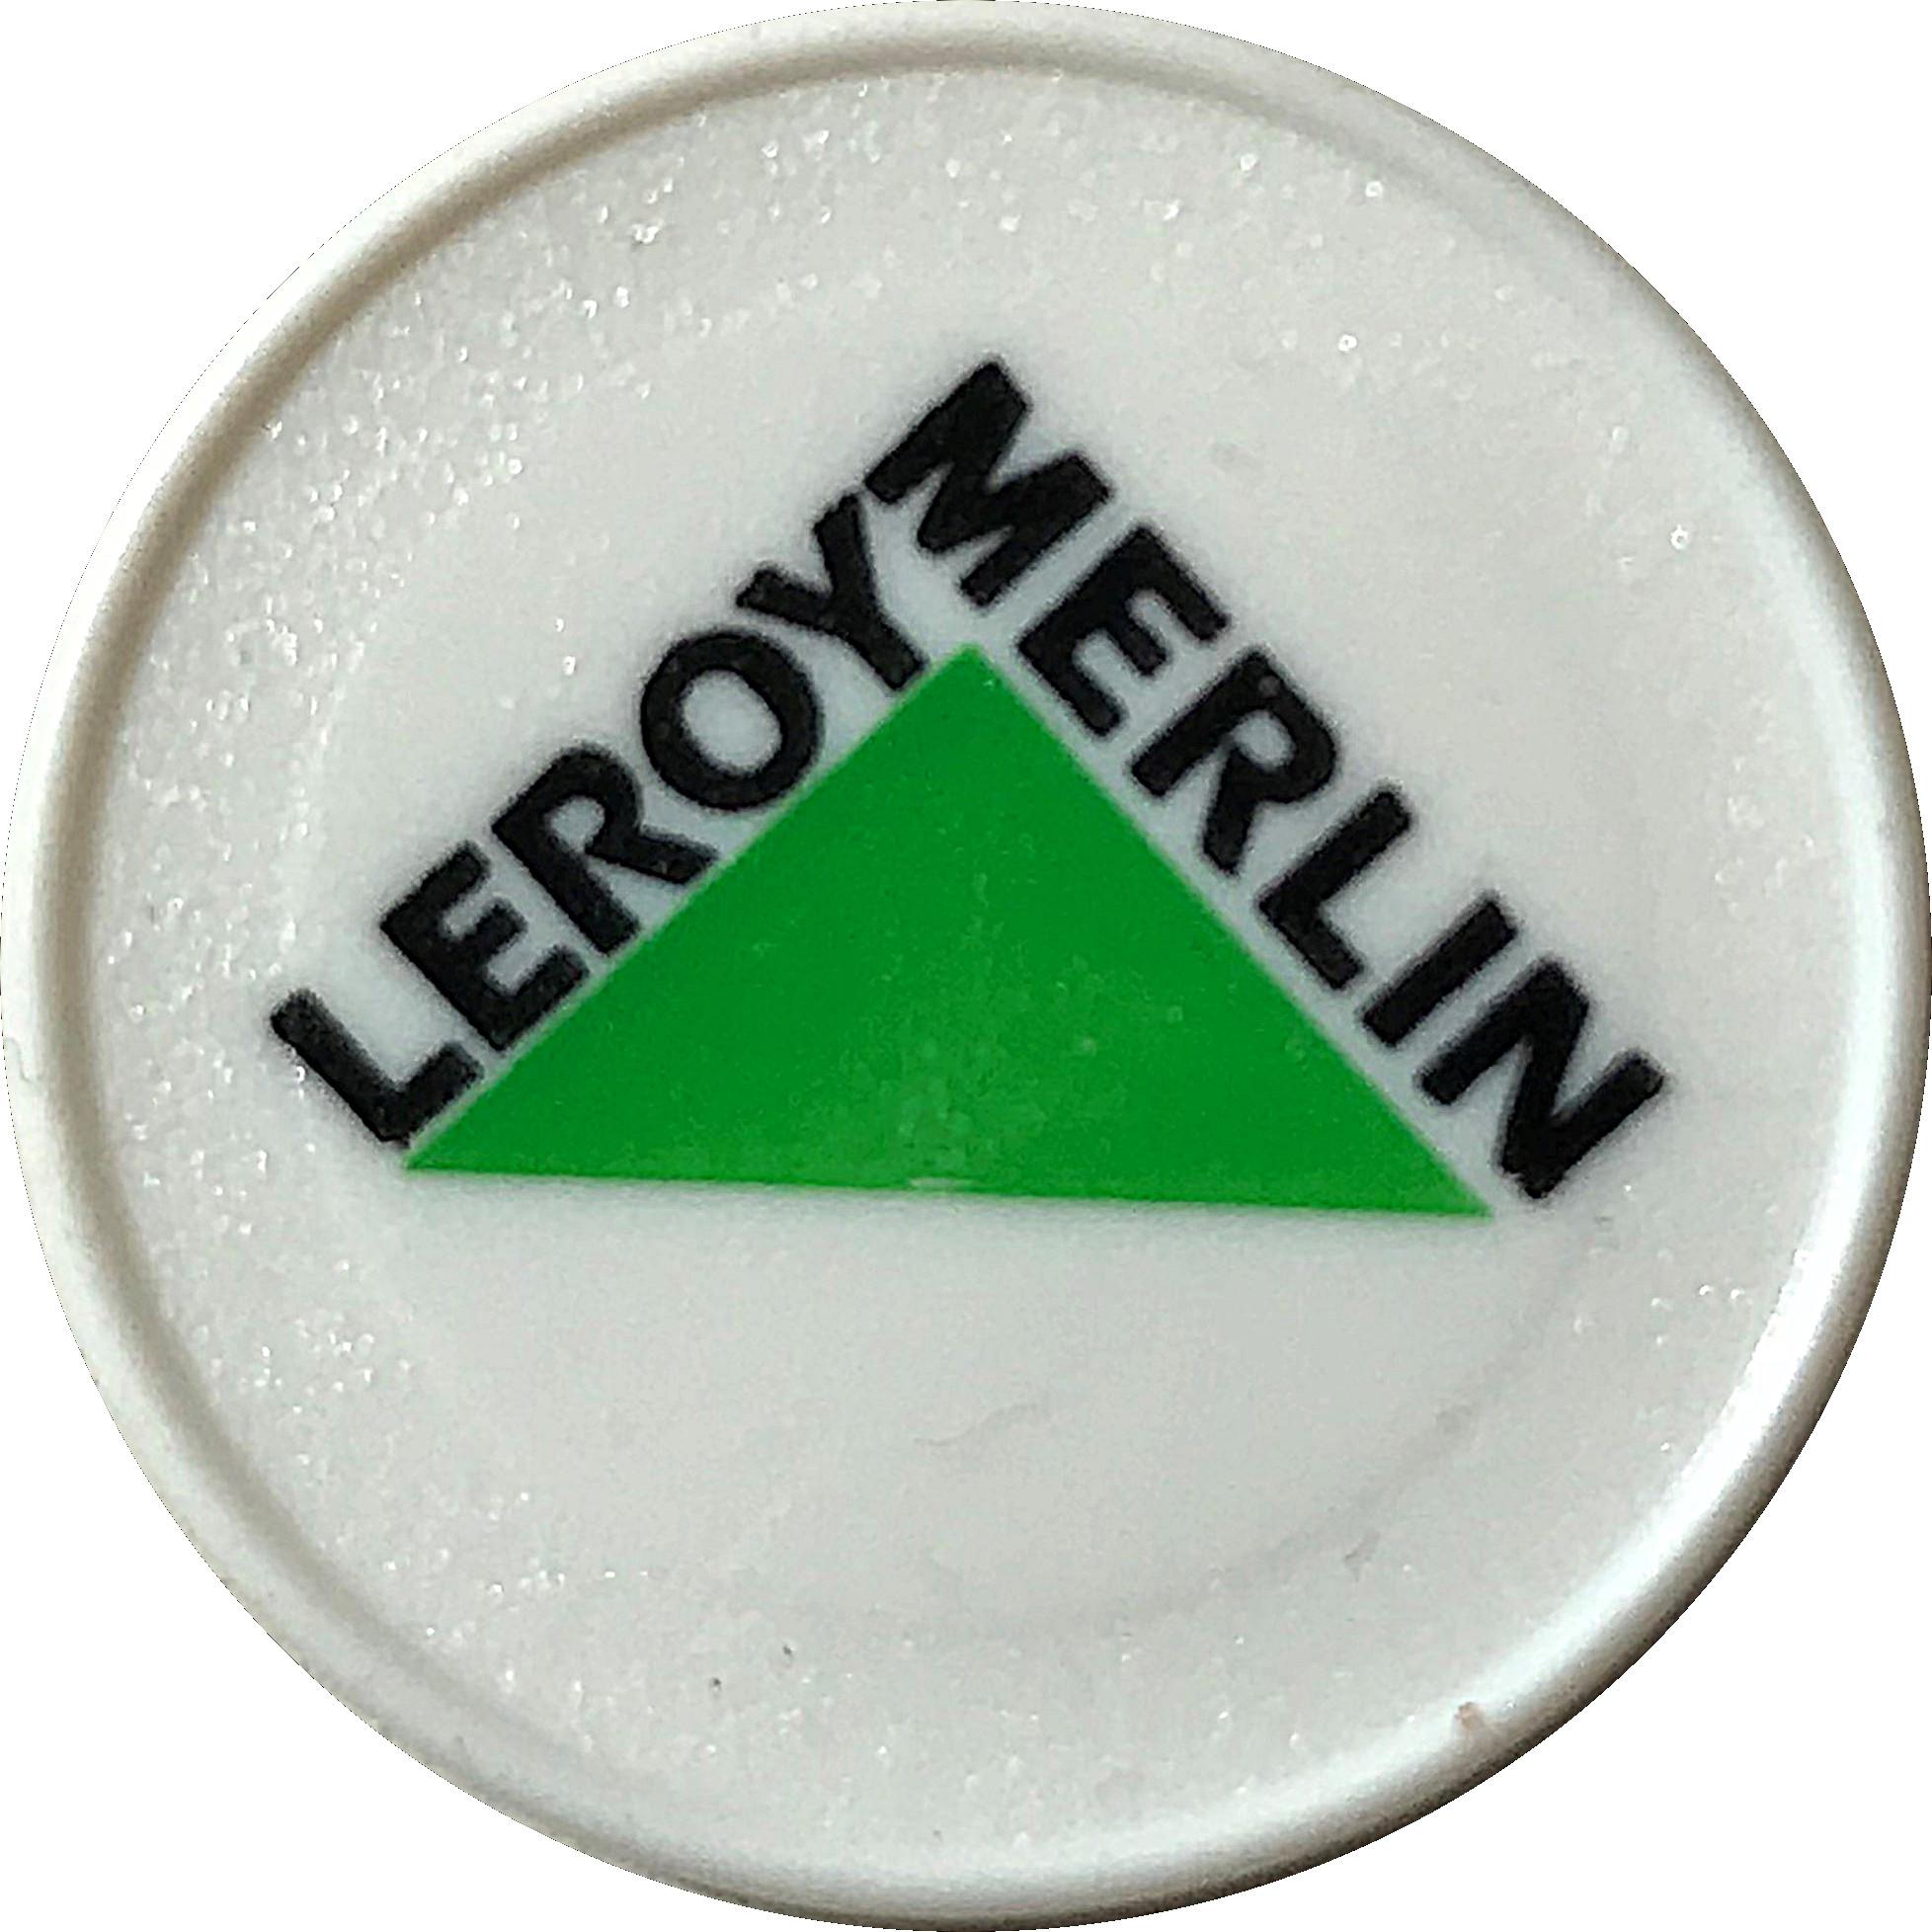 Shopping Cart Token - Leroy Merlin (1 Euro) - Portugal – Numista